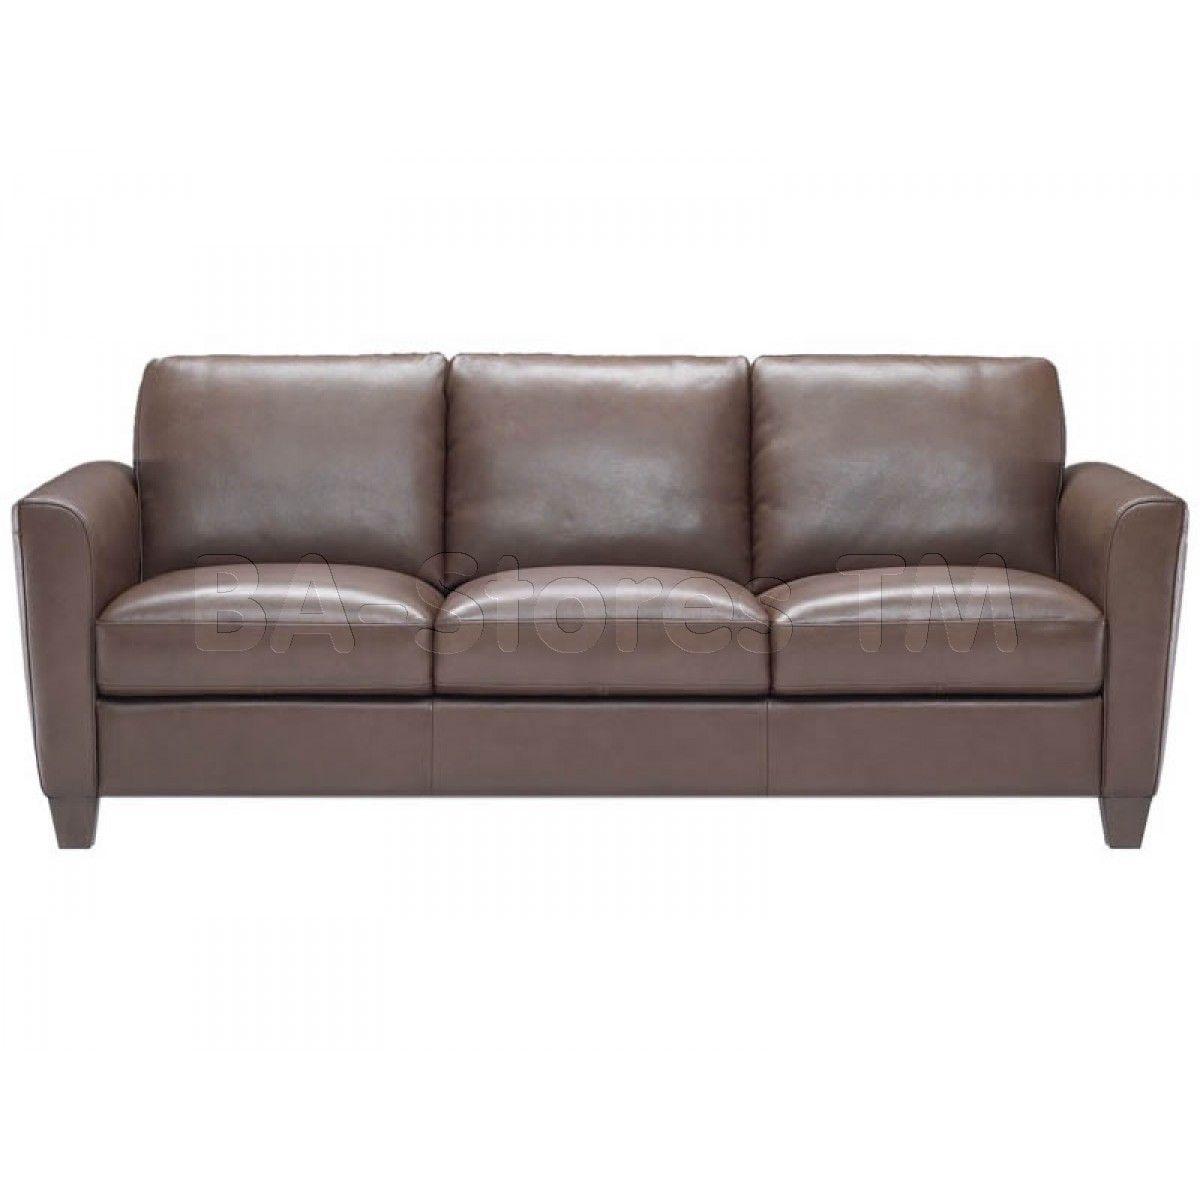 Natuzzi Editions Transitional Leather Sofa B592 With Images Leather Sleeper Sofa Italian Furniture Modern Sofa